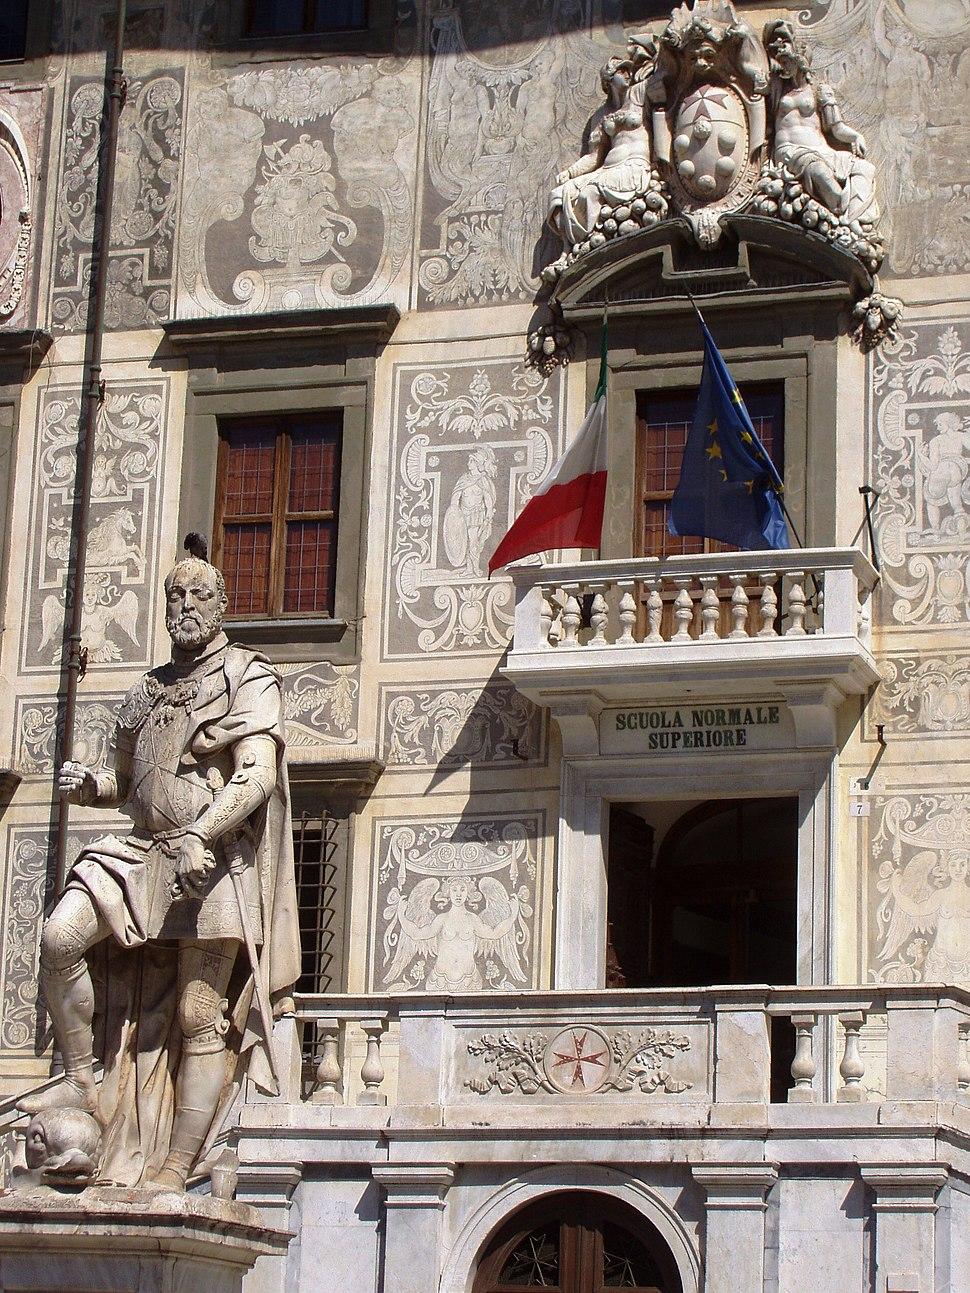 Palazzo dei Cavalieri (detail) - Pisa, Italy